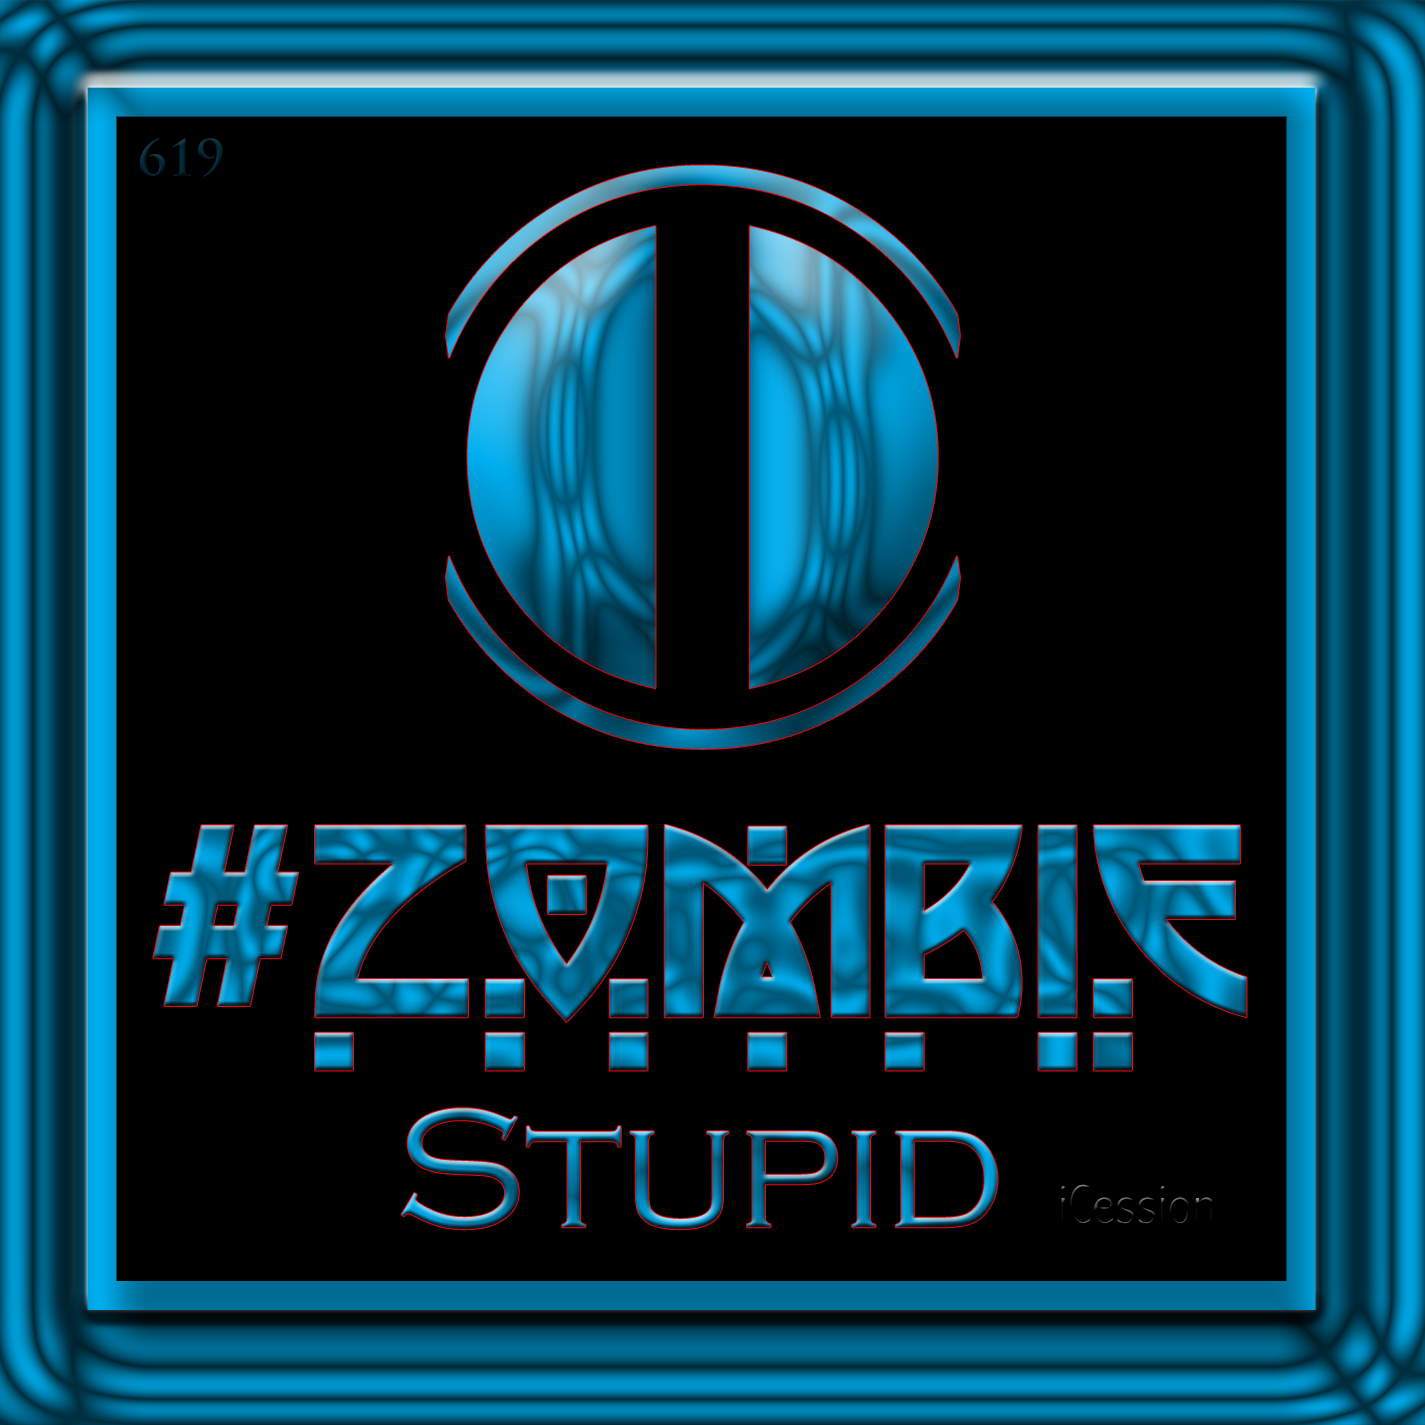 #ZombieStupid (iCession)